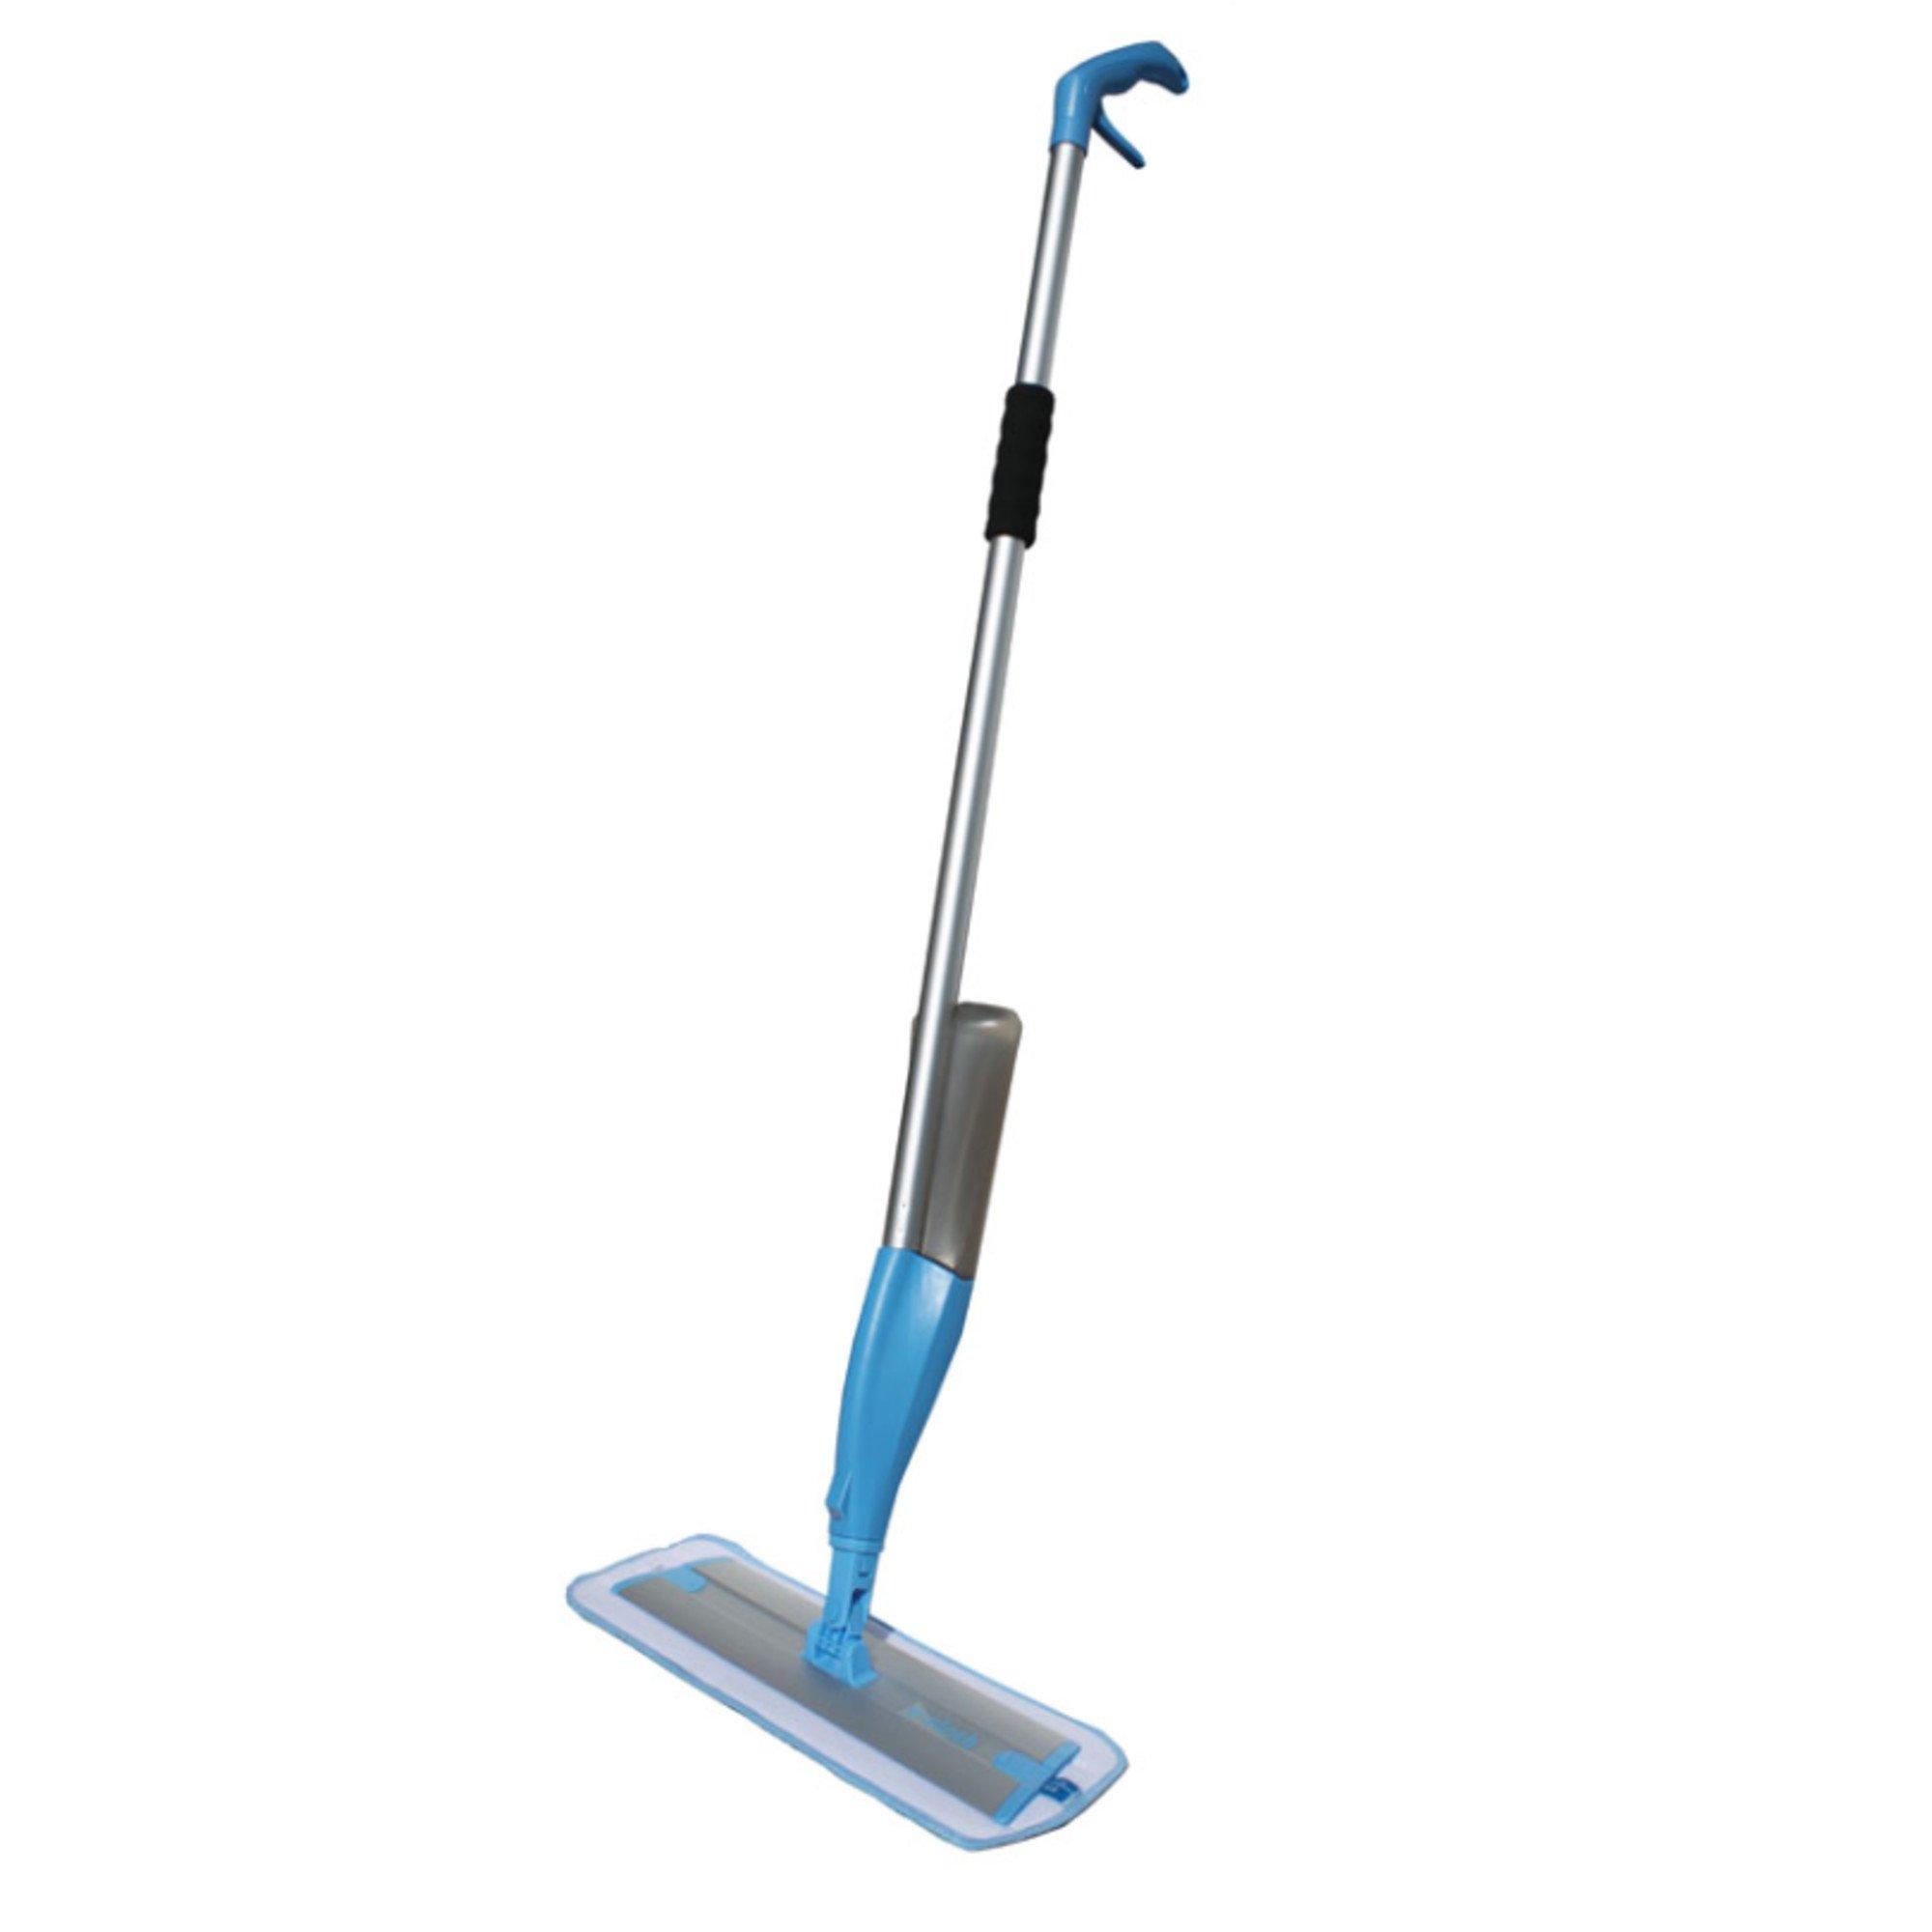 E Cloth Aqua Spray Deep Clean Mop With On Board Water